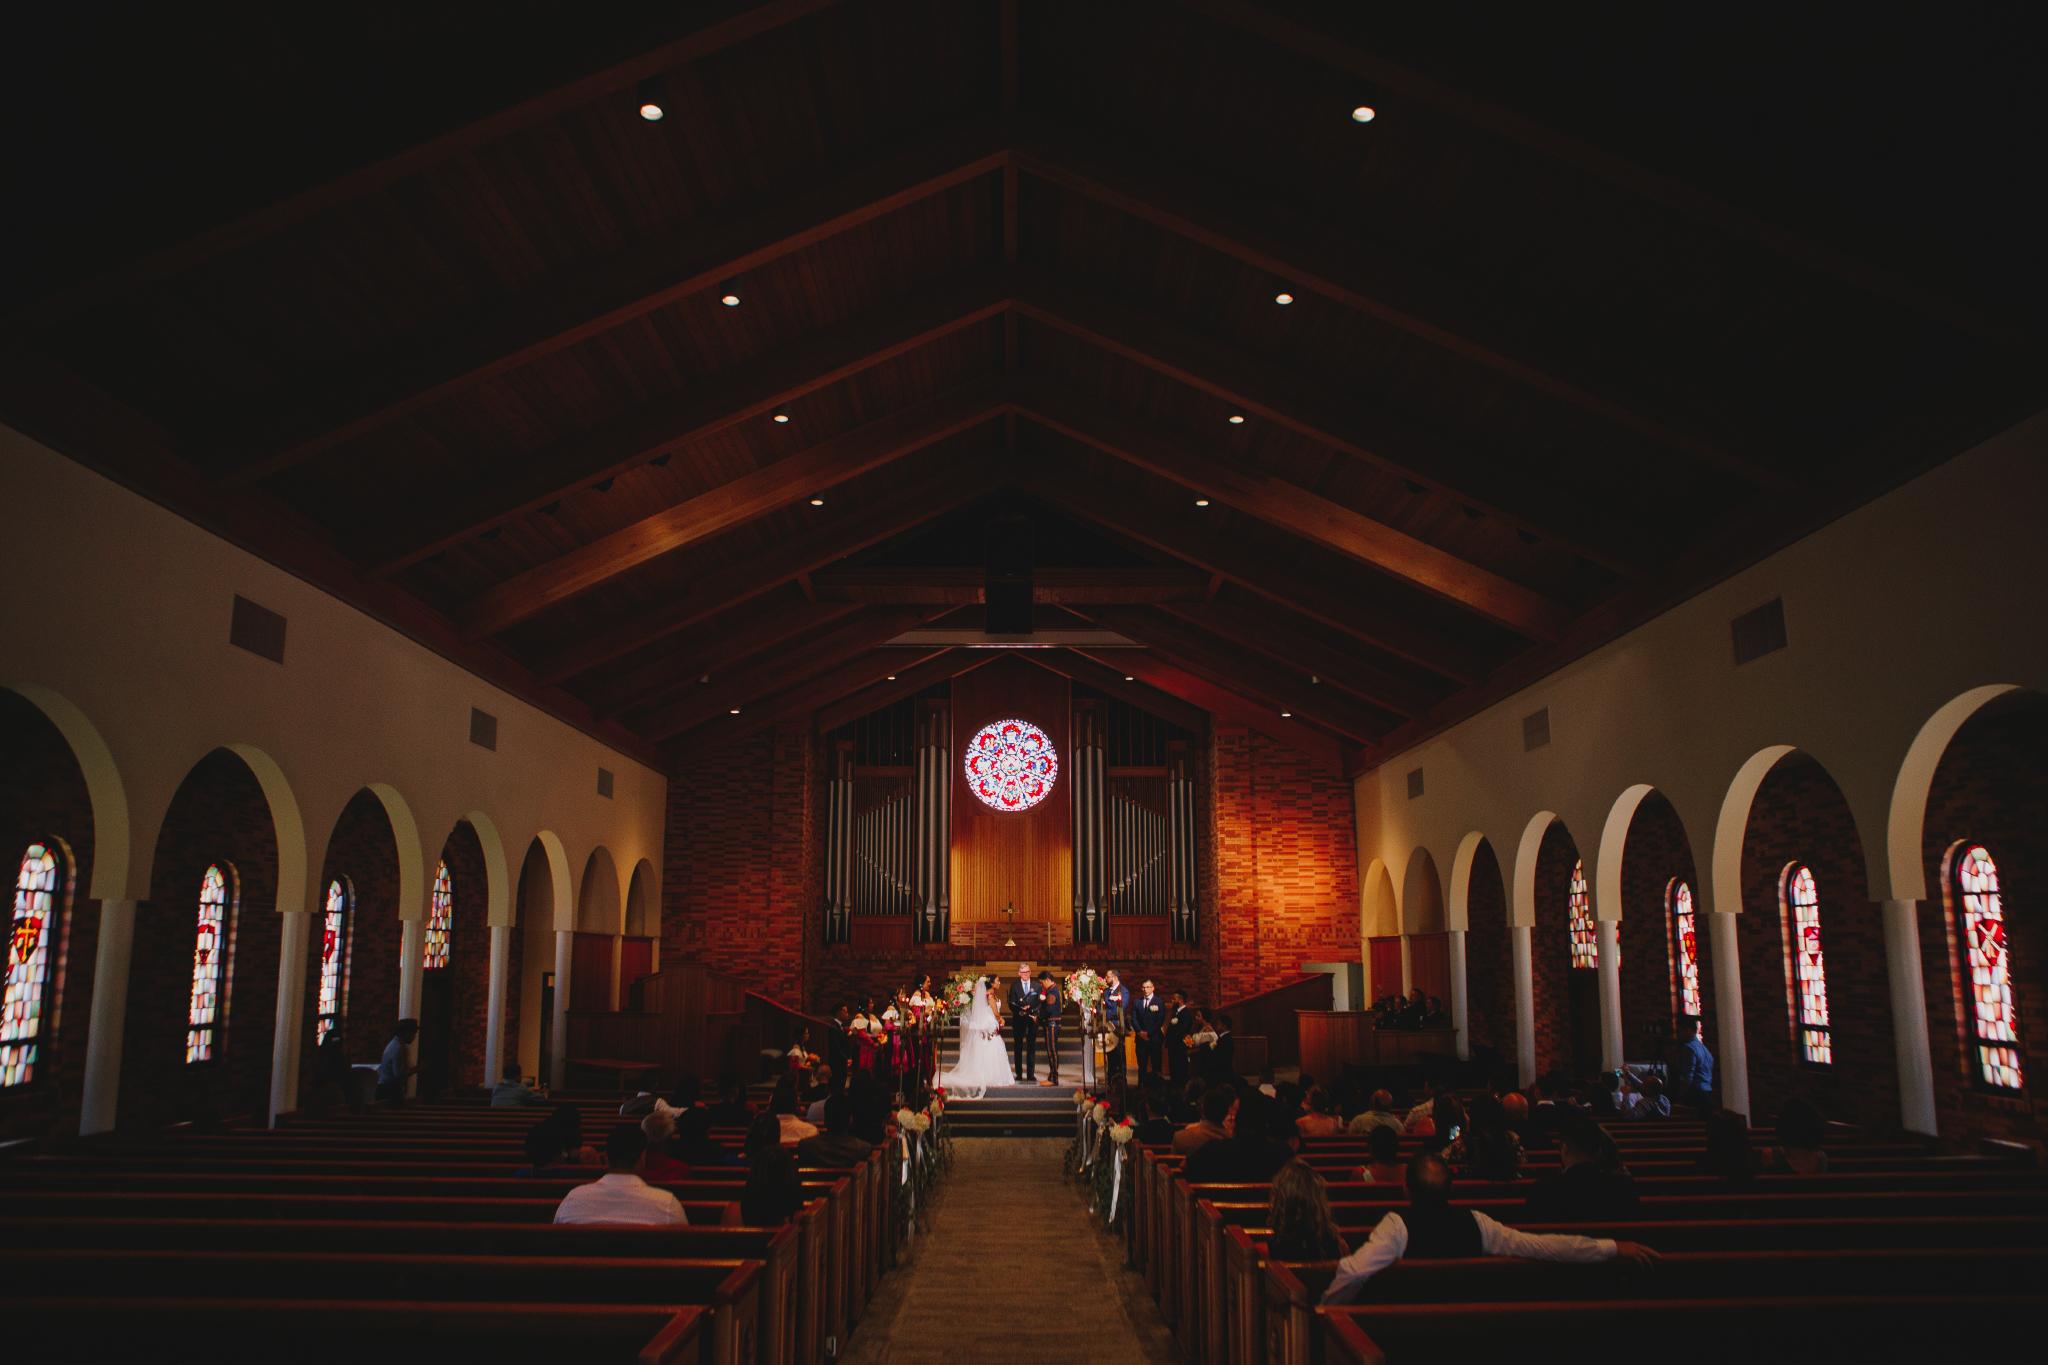 San Diego Wedding Photographer | Torrey pines church interior